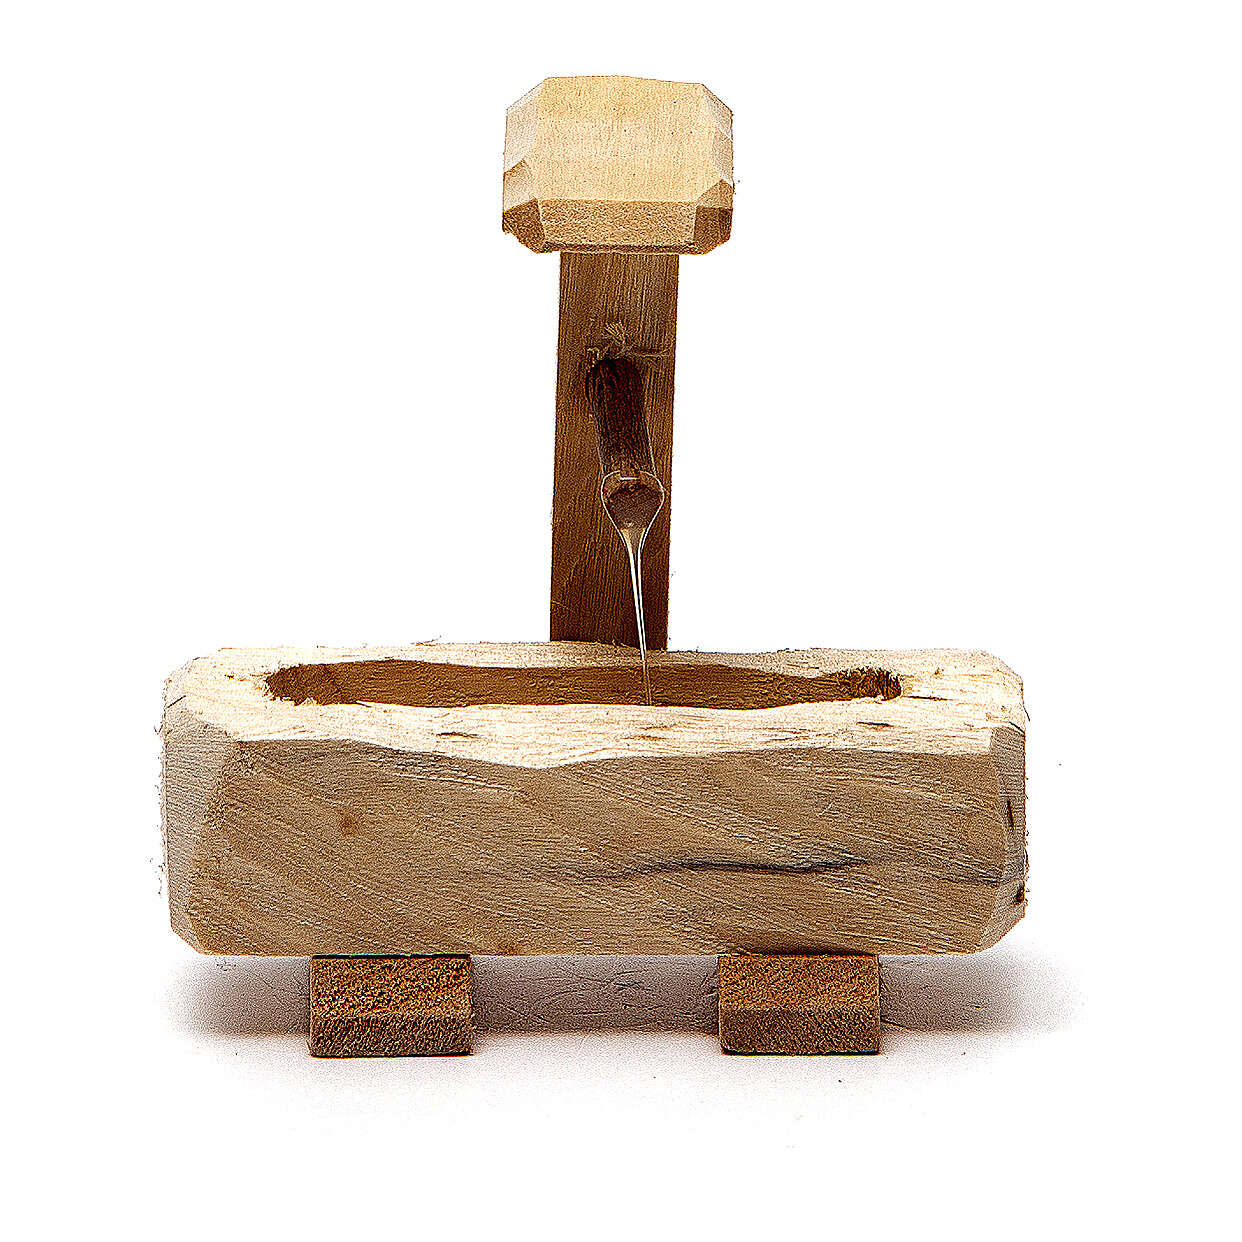 Little Fountain in wood 8x5x8cm 4